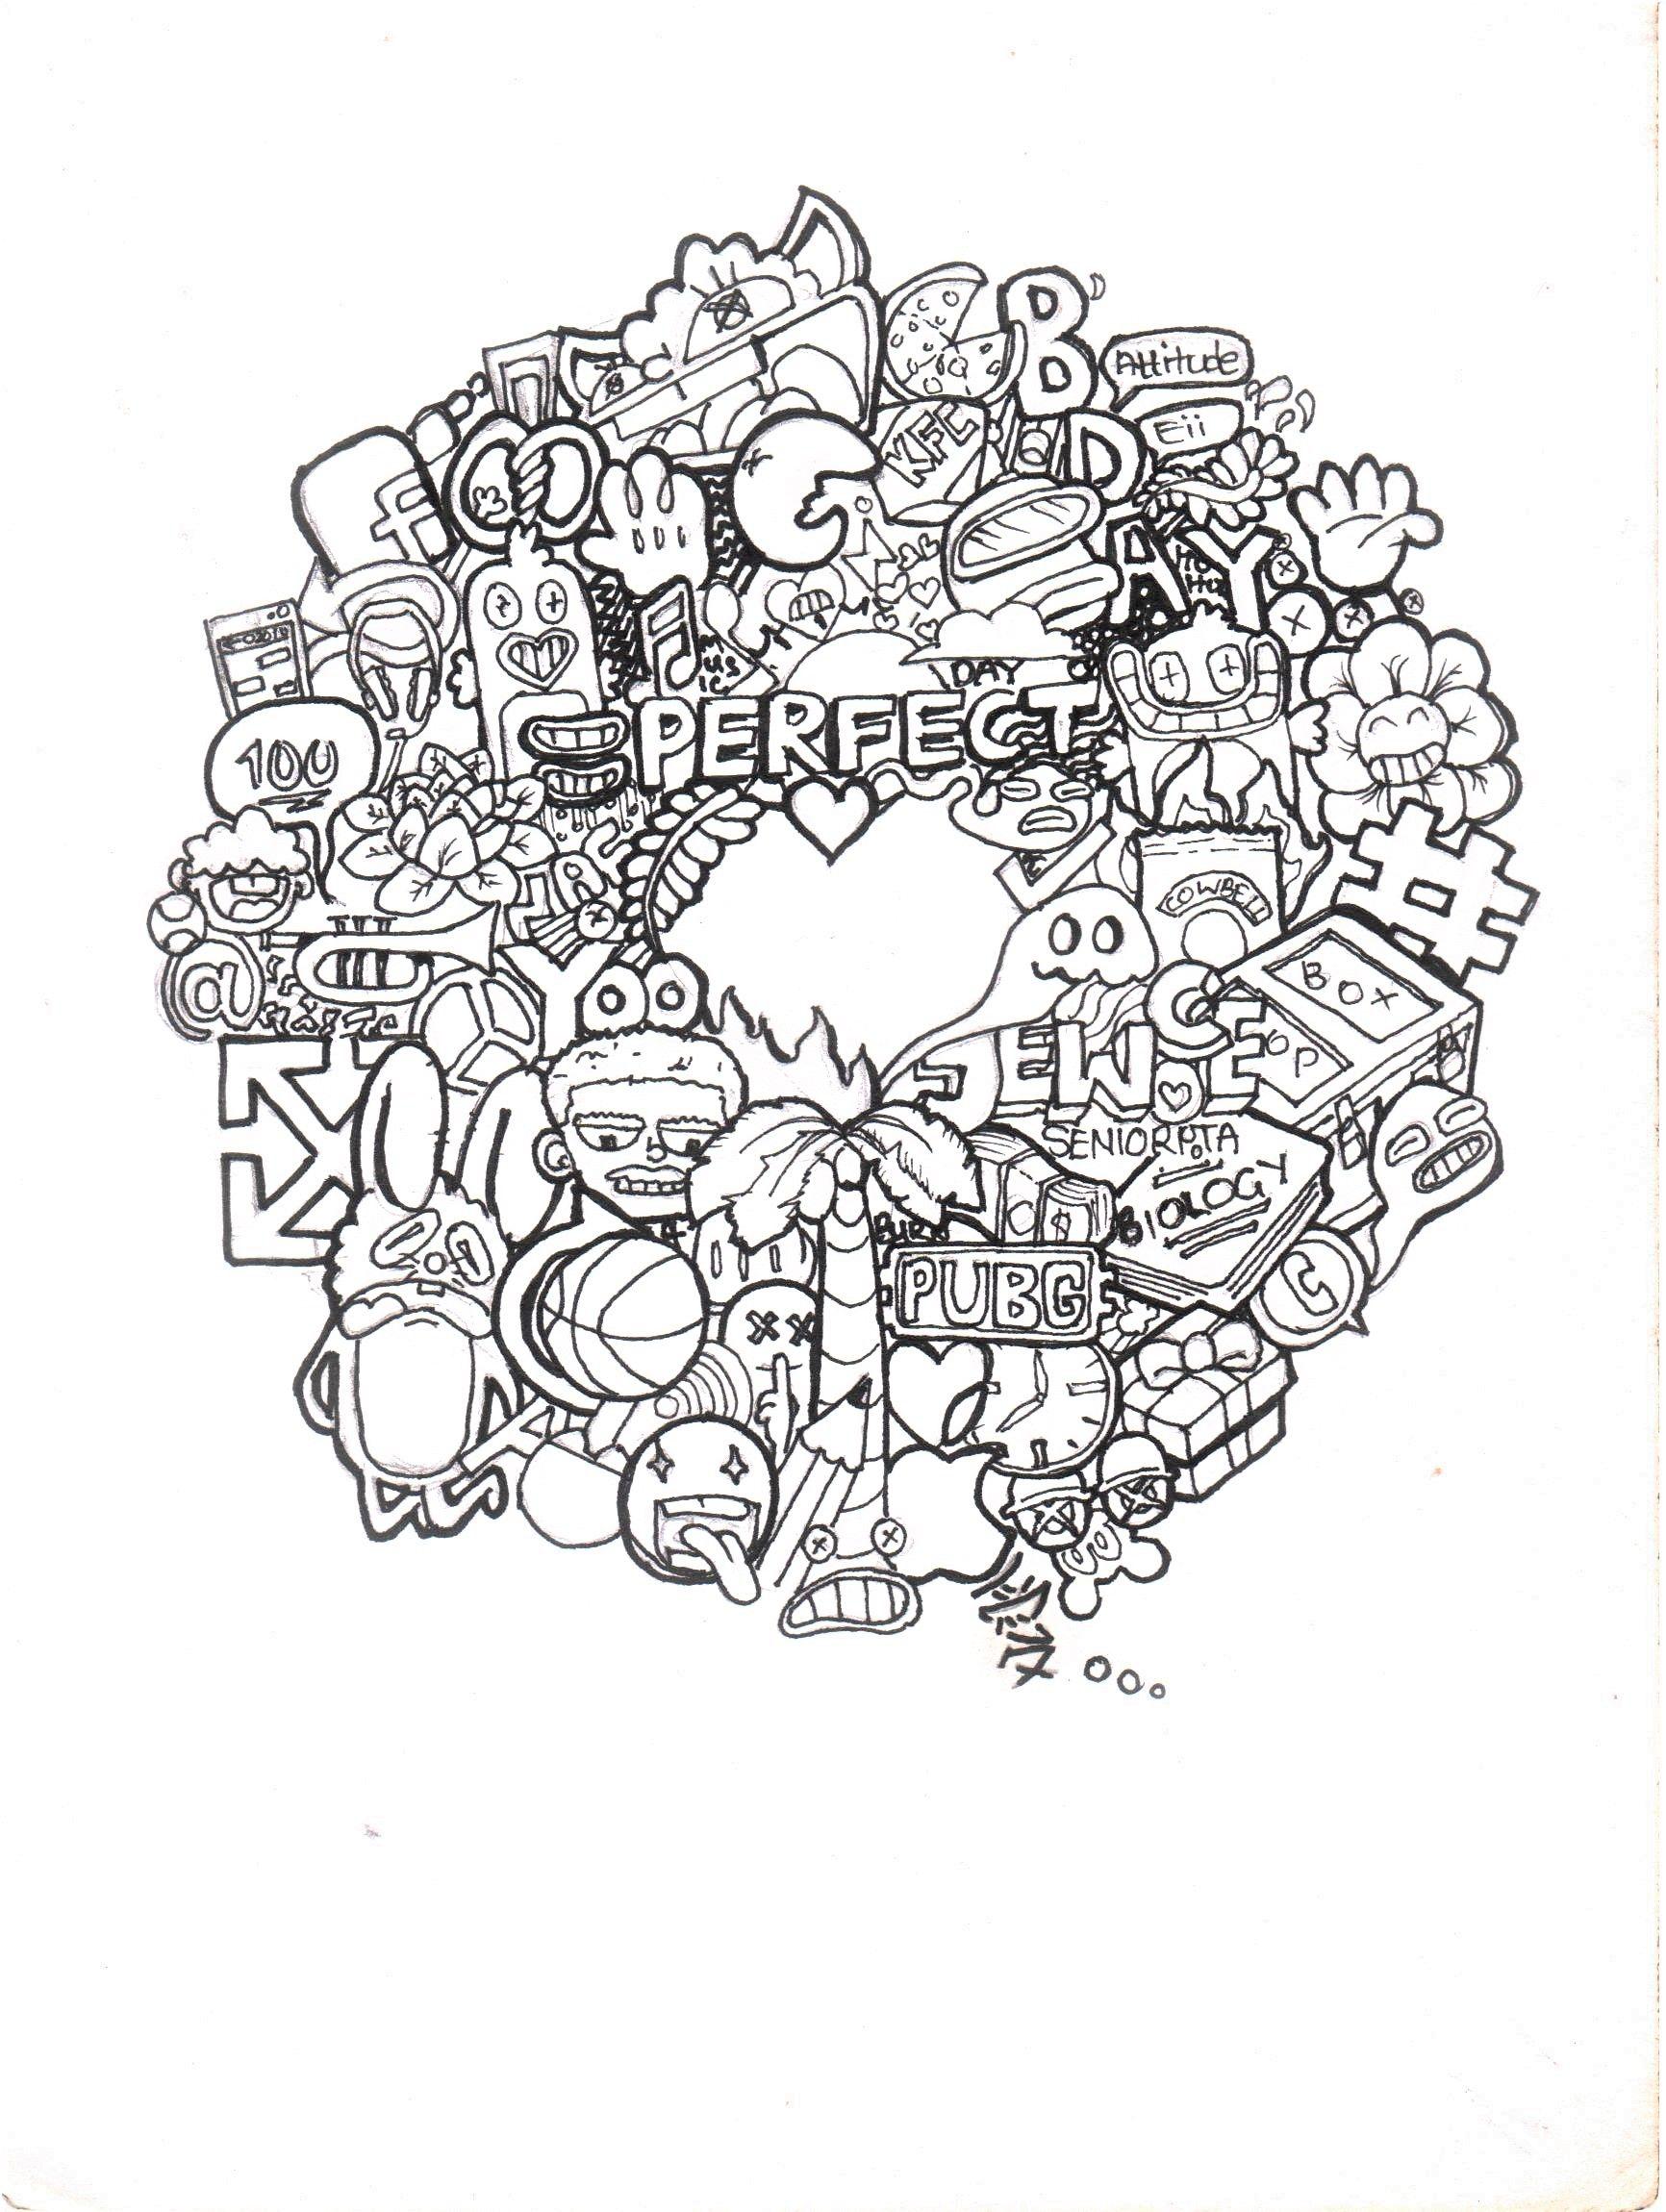 doodling  Doodles, Coloring pages, Doodle art